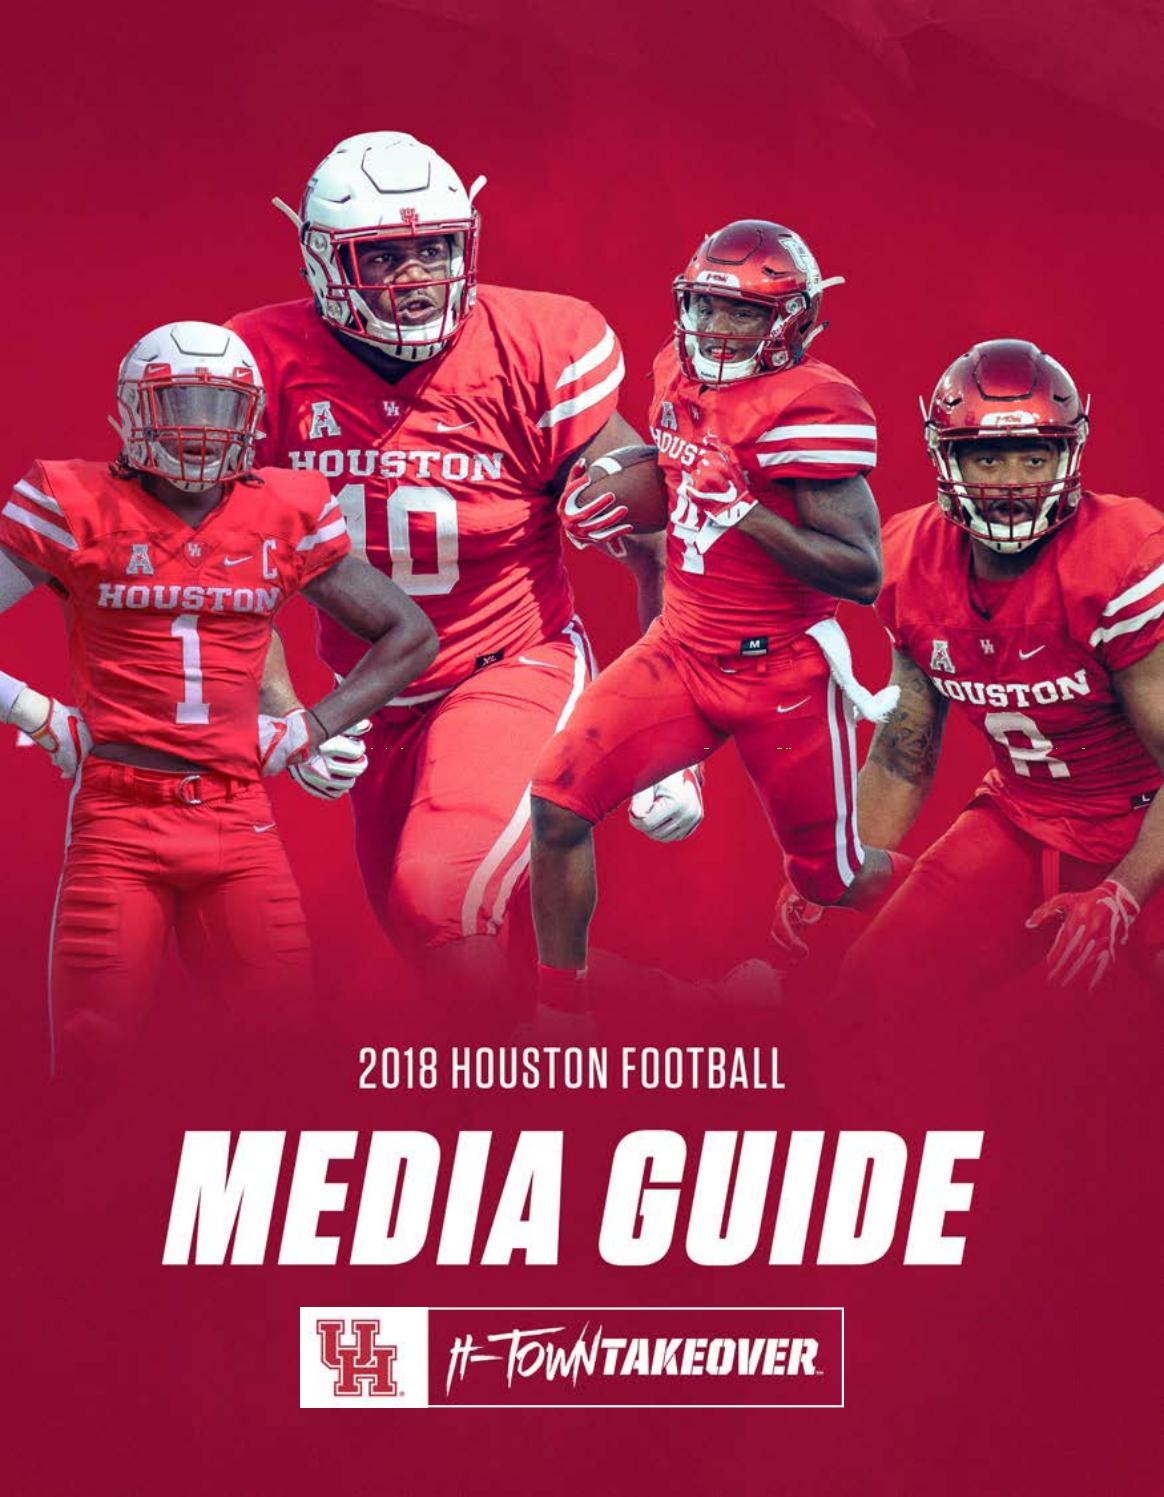 2018 Houston Football Media Guide by David Bassity - issuu